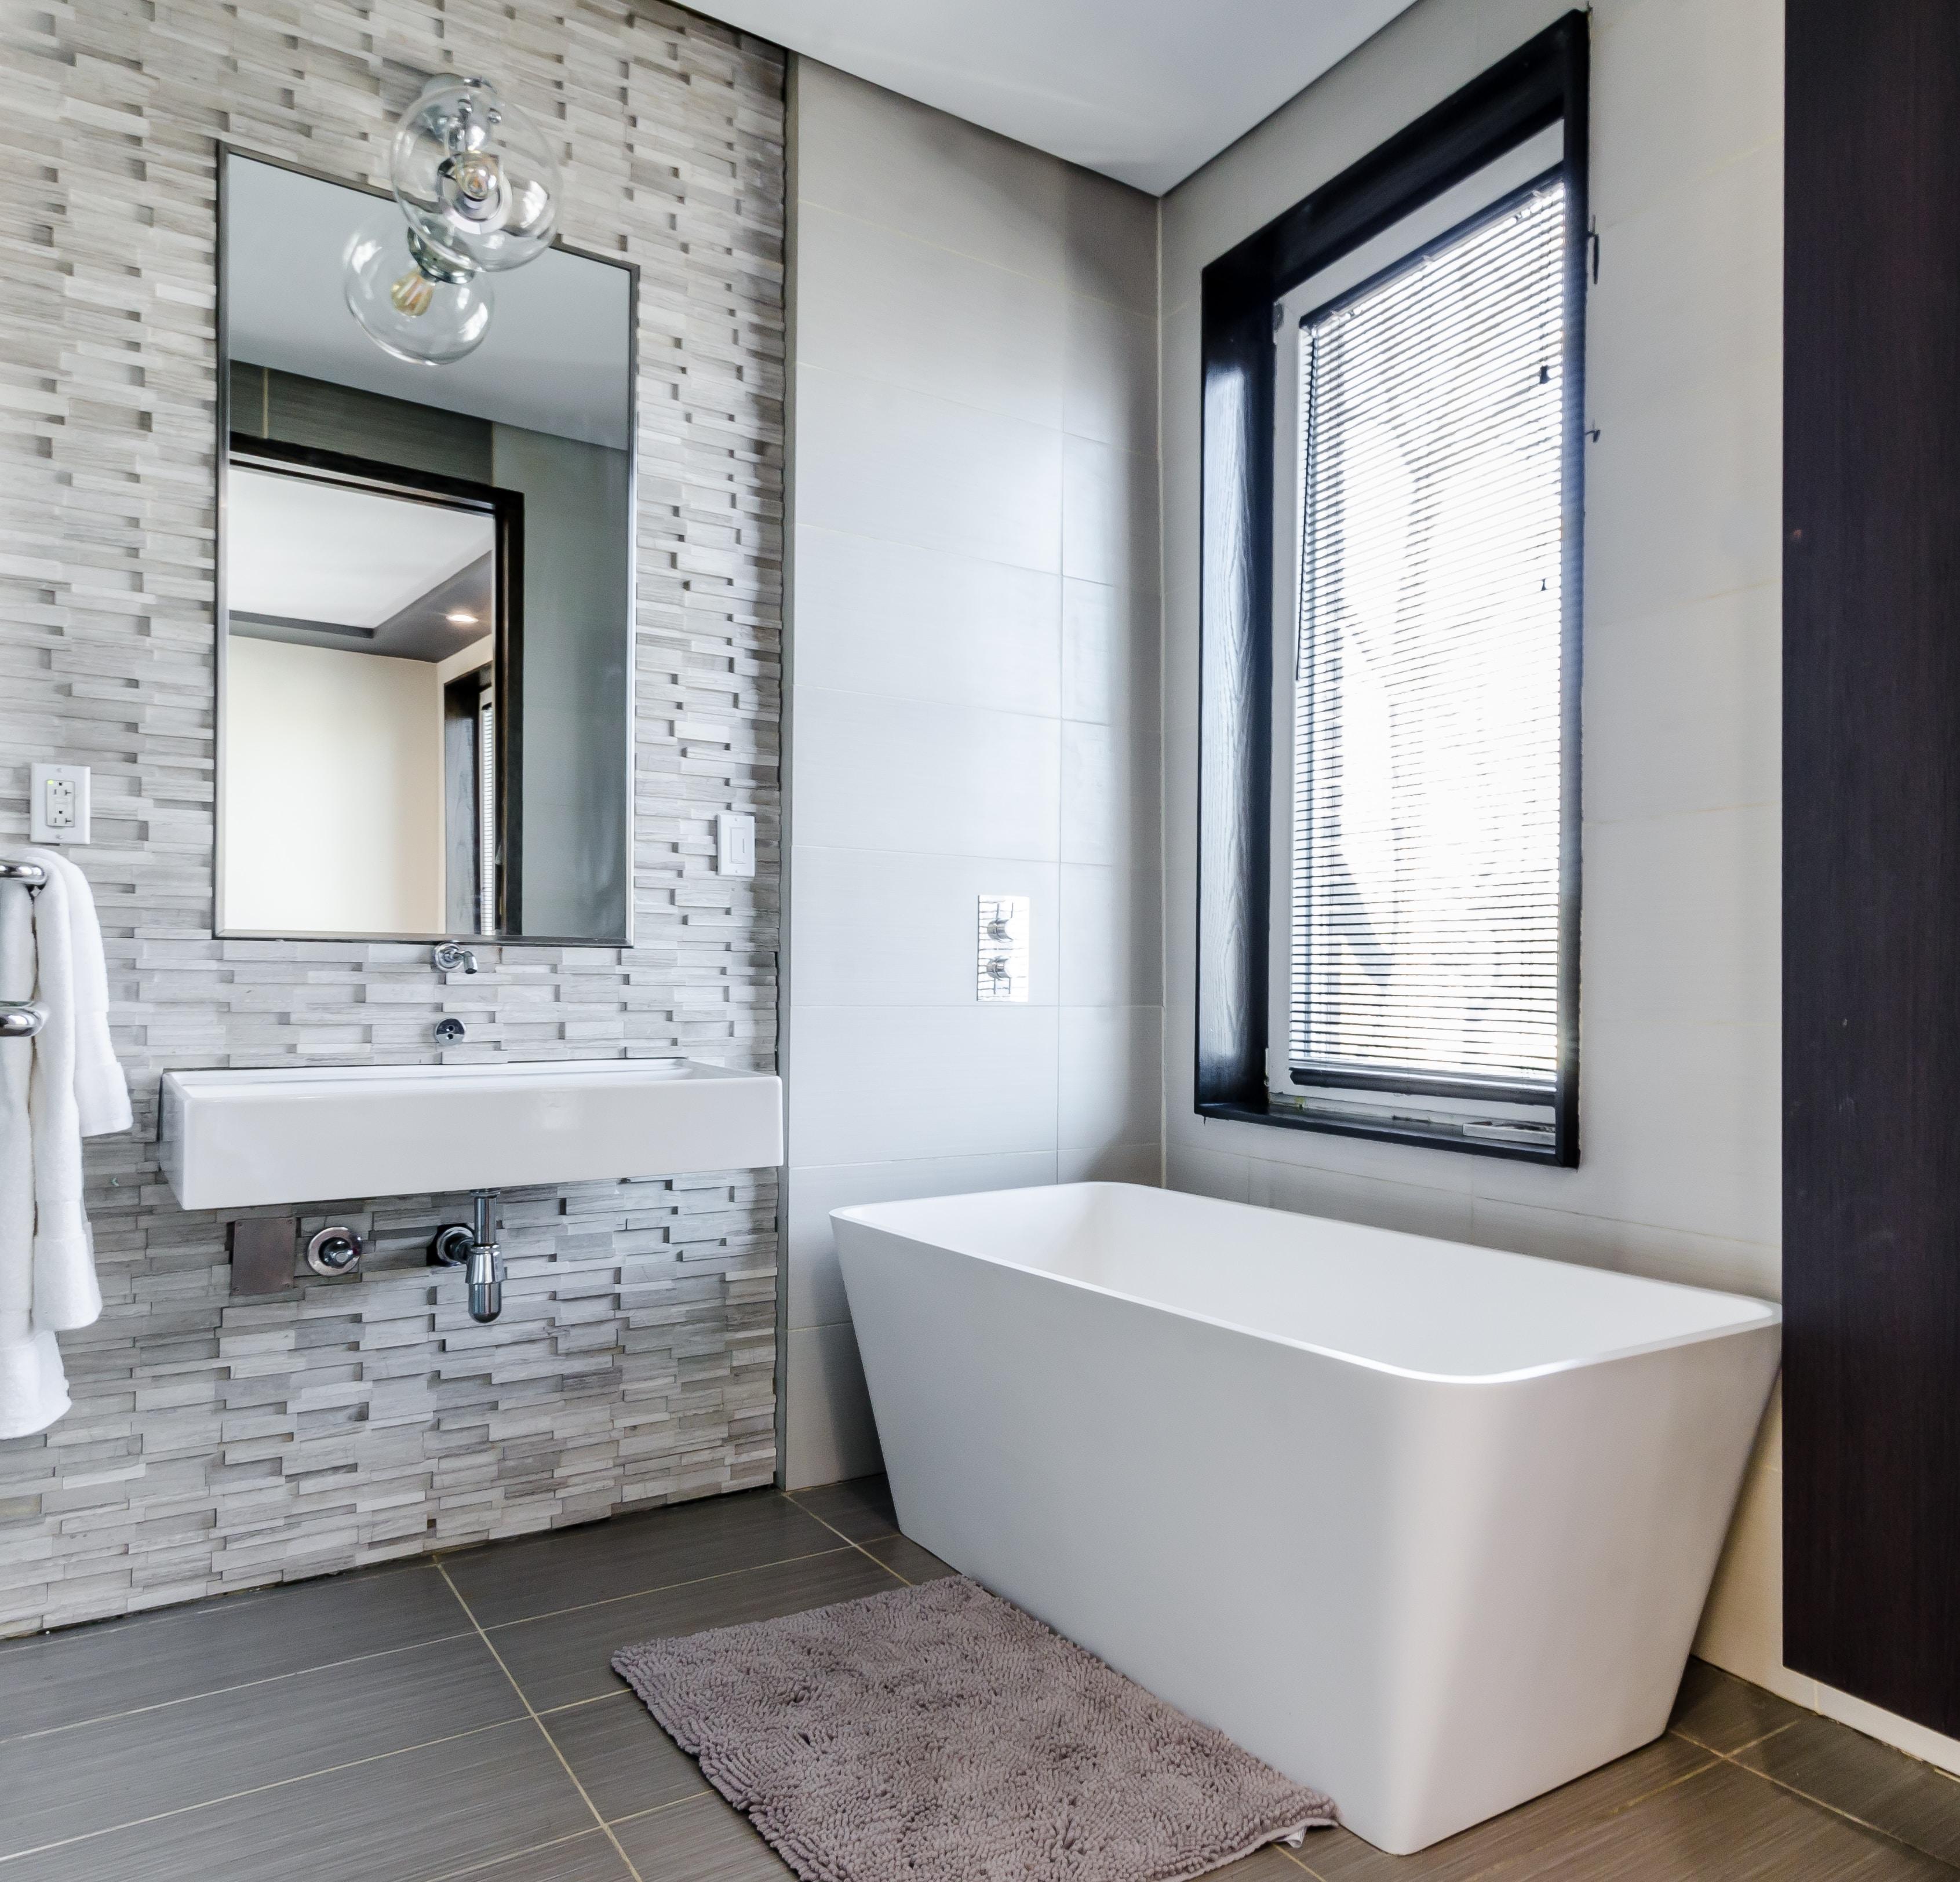 Bathroom tiling project